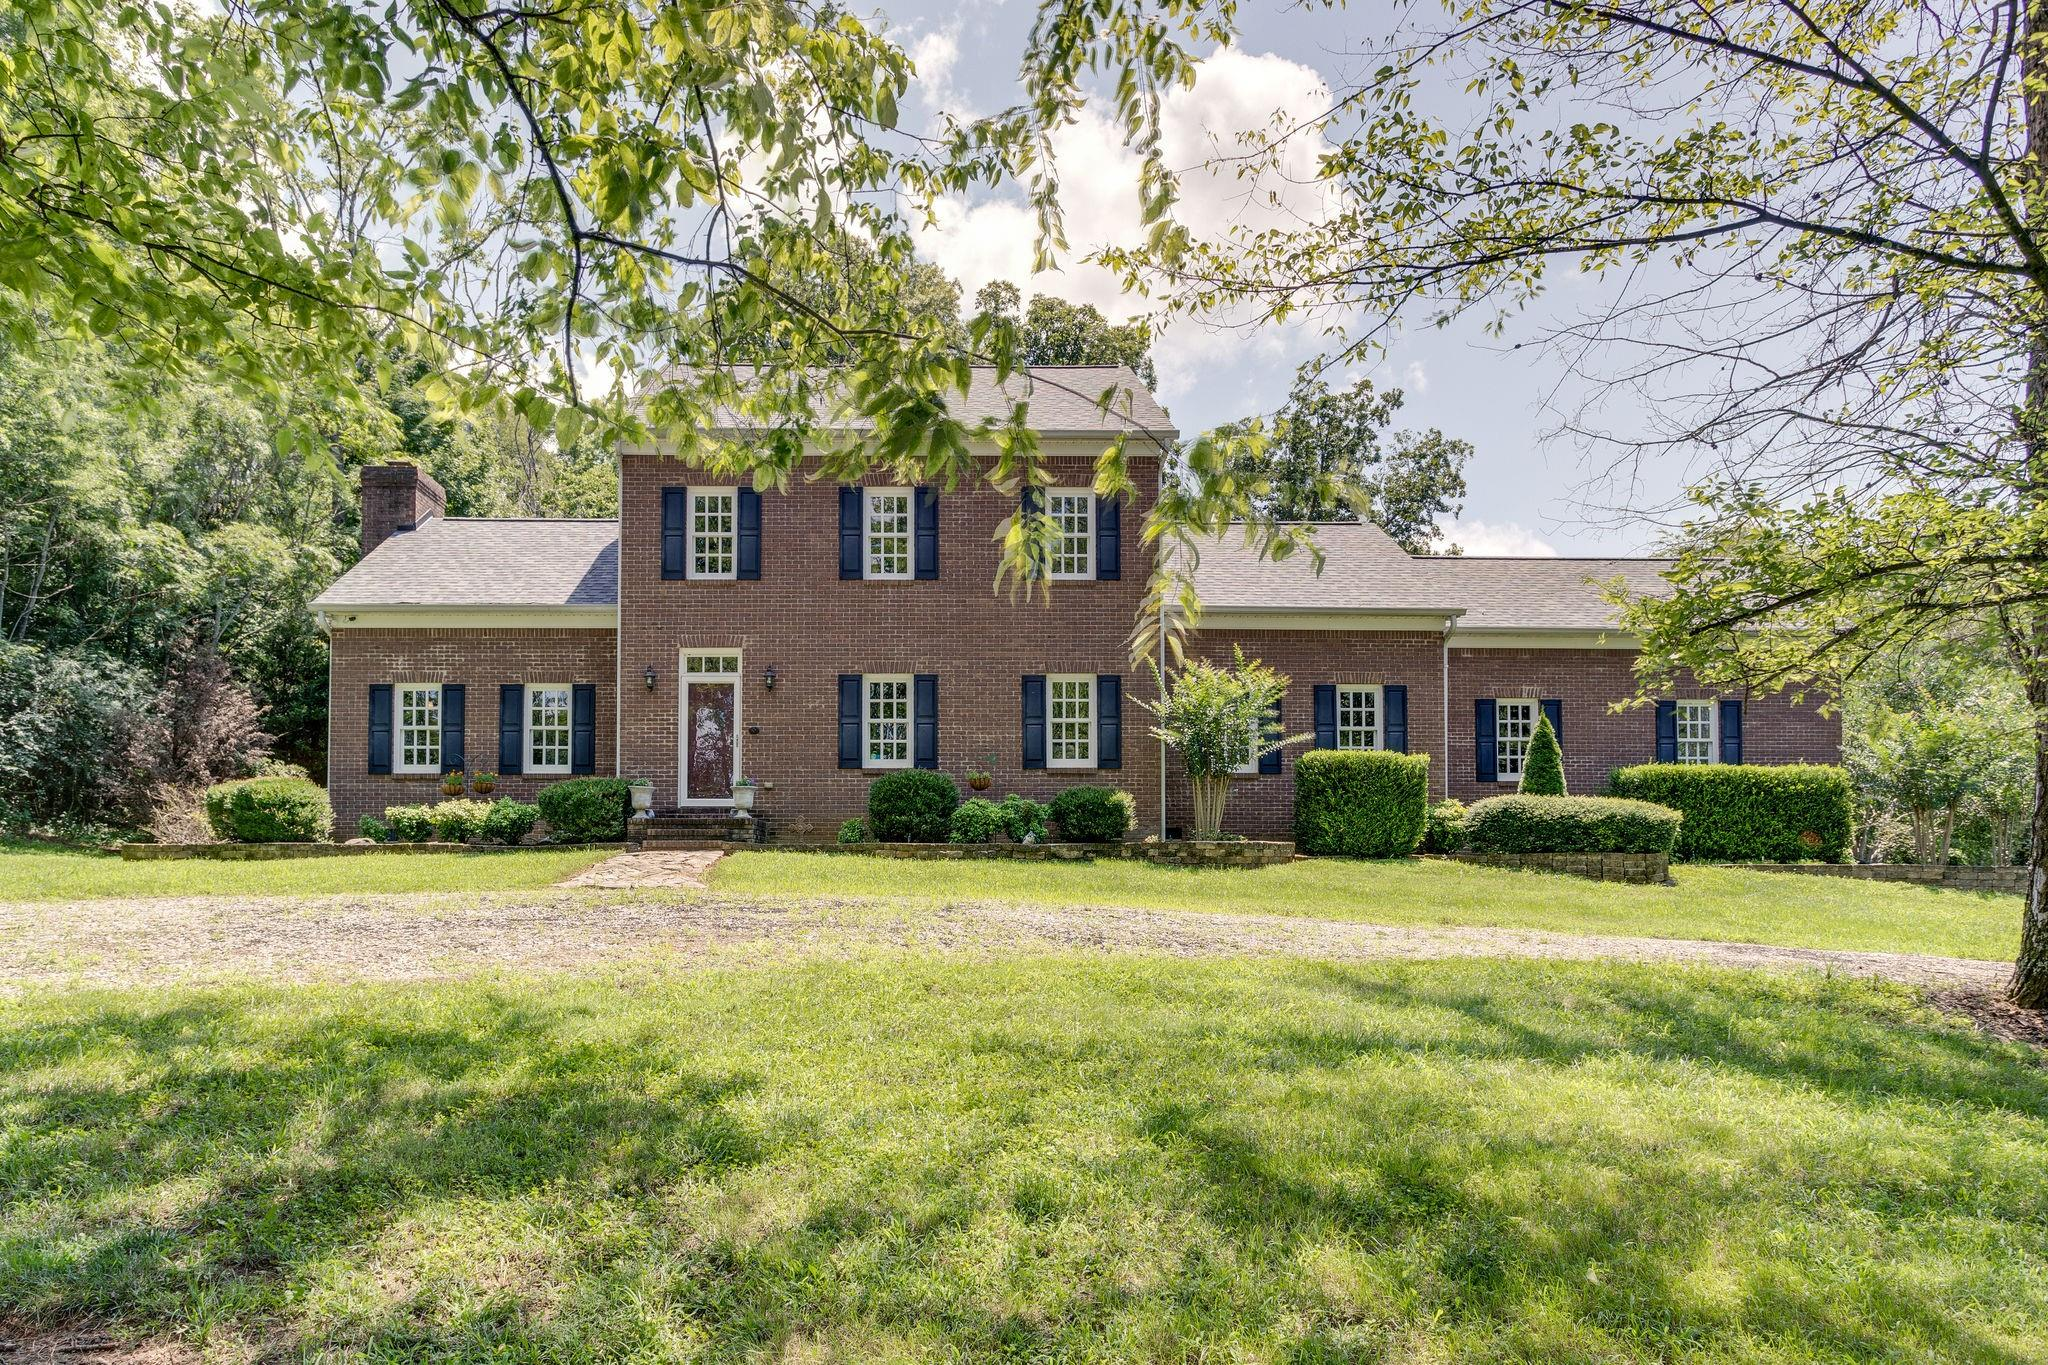 3791 McCandless Rd, Columbia, TN 38401 - Columbia, TN real estate listing